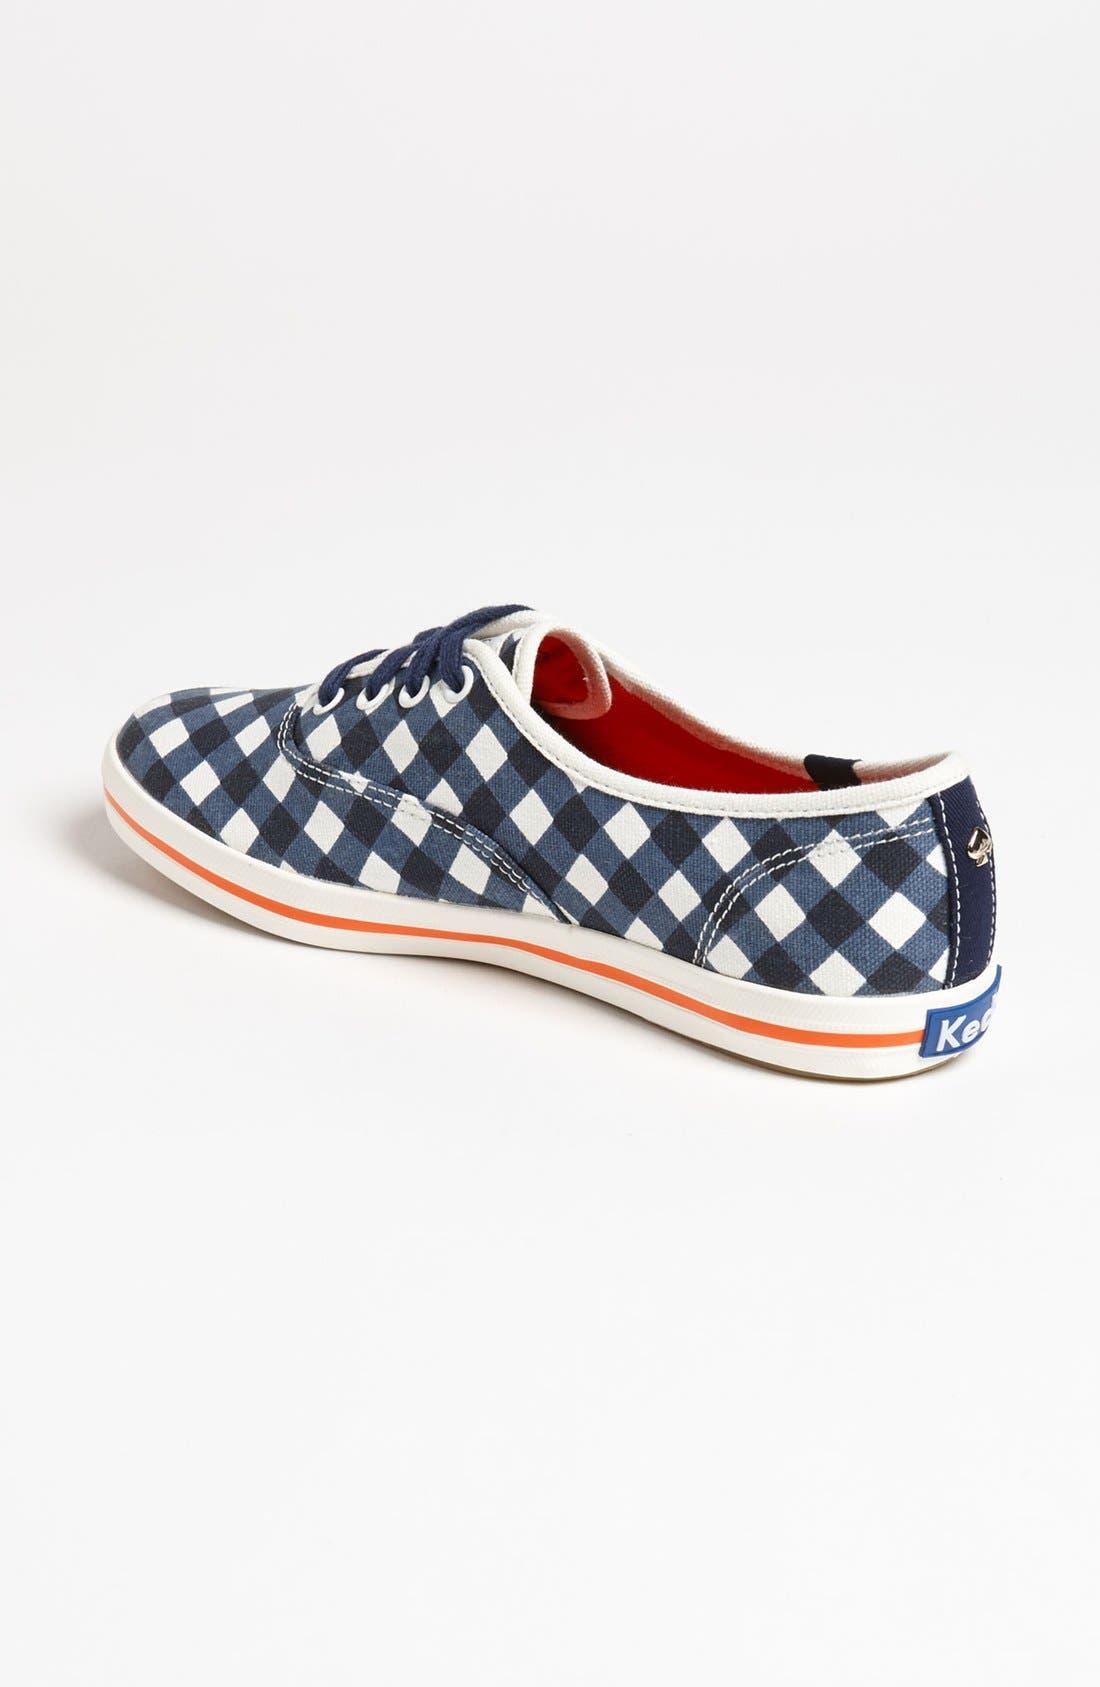 Keds<sup>®</sup> for kate spade new york 'kick' sneaker,                             Alternate thumbnail 14, color,